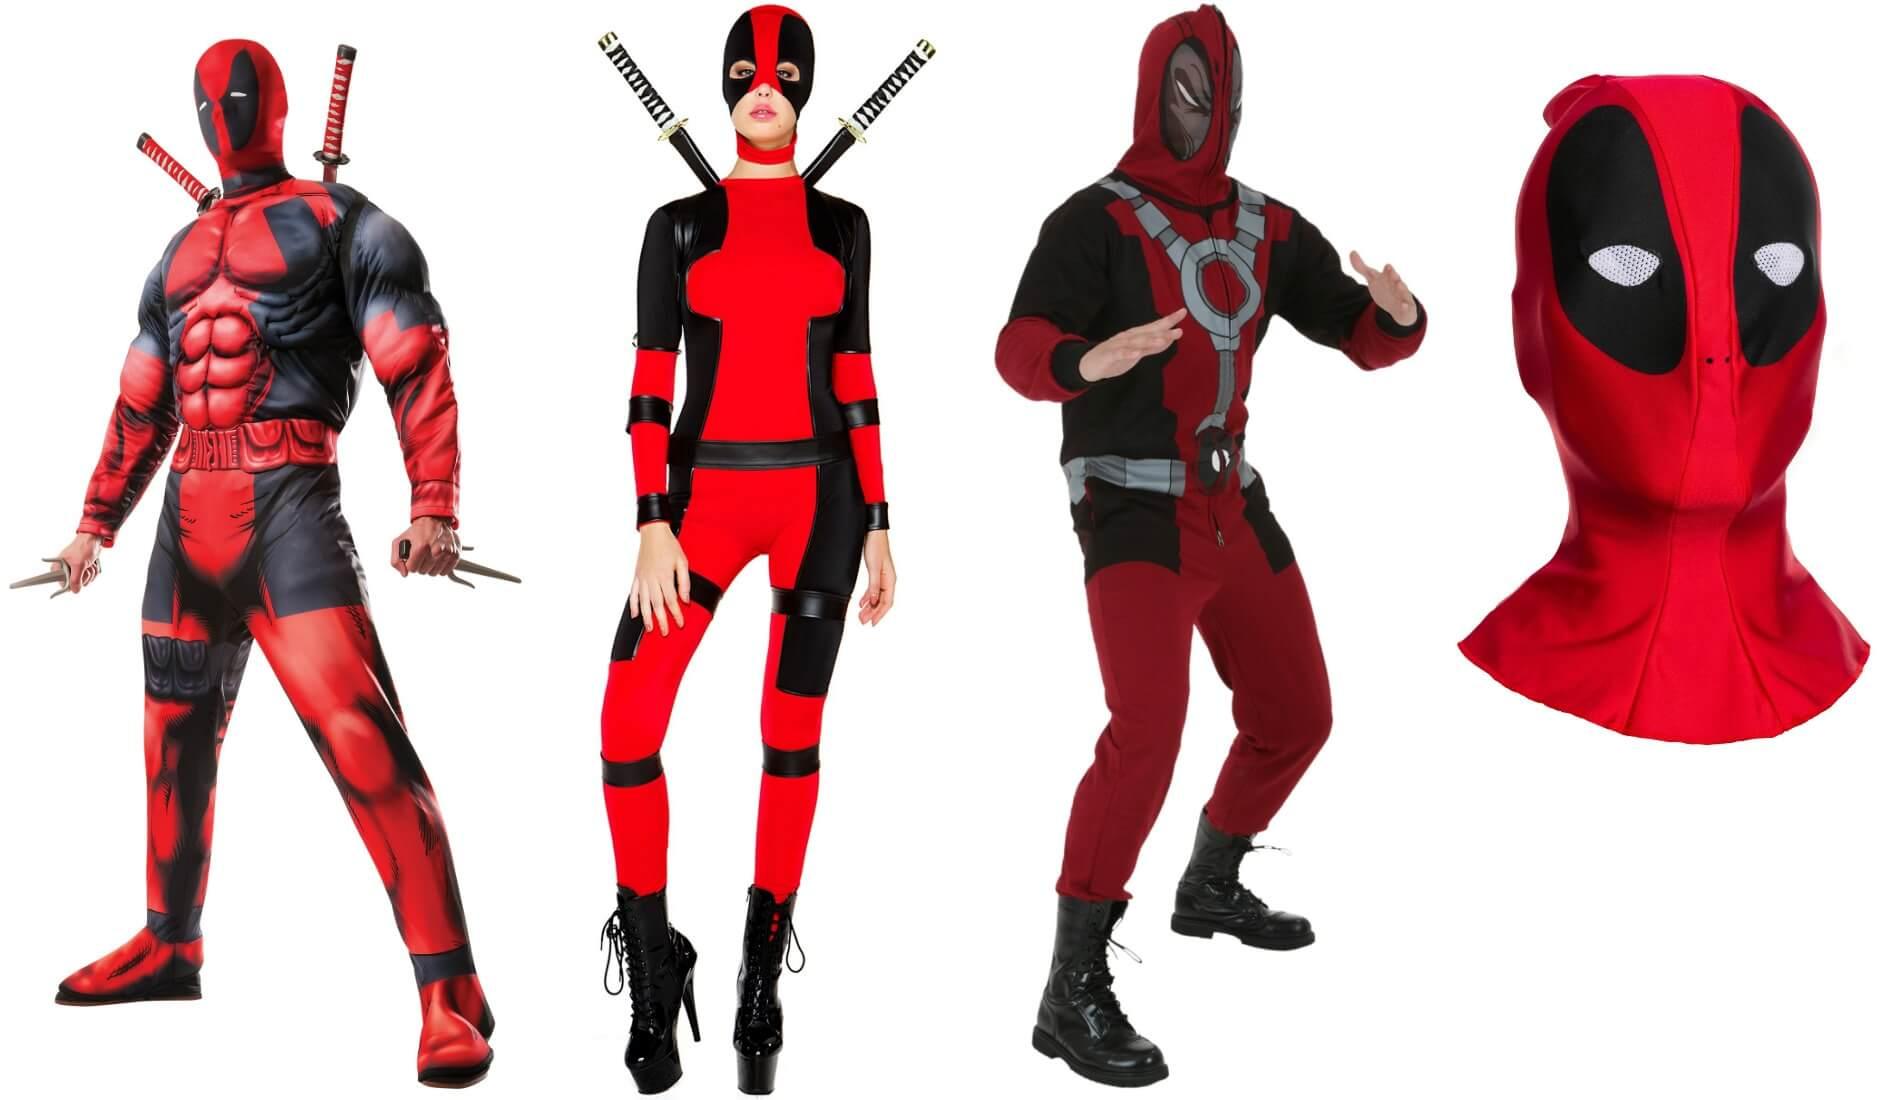 Halfway to Halloween Costume Ideas for 2016 - Halloween Costumes Blog